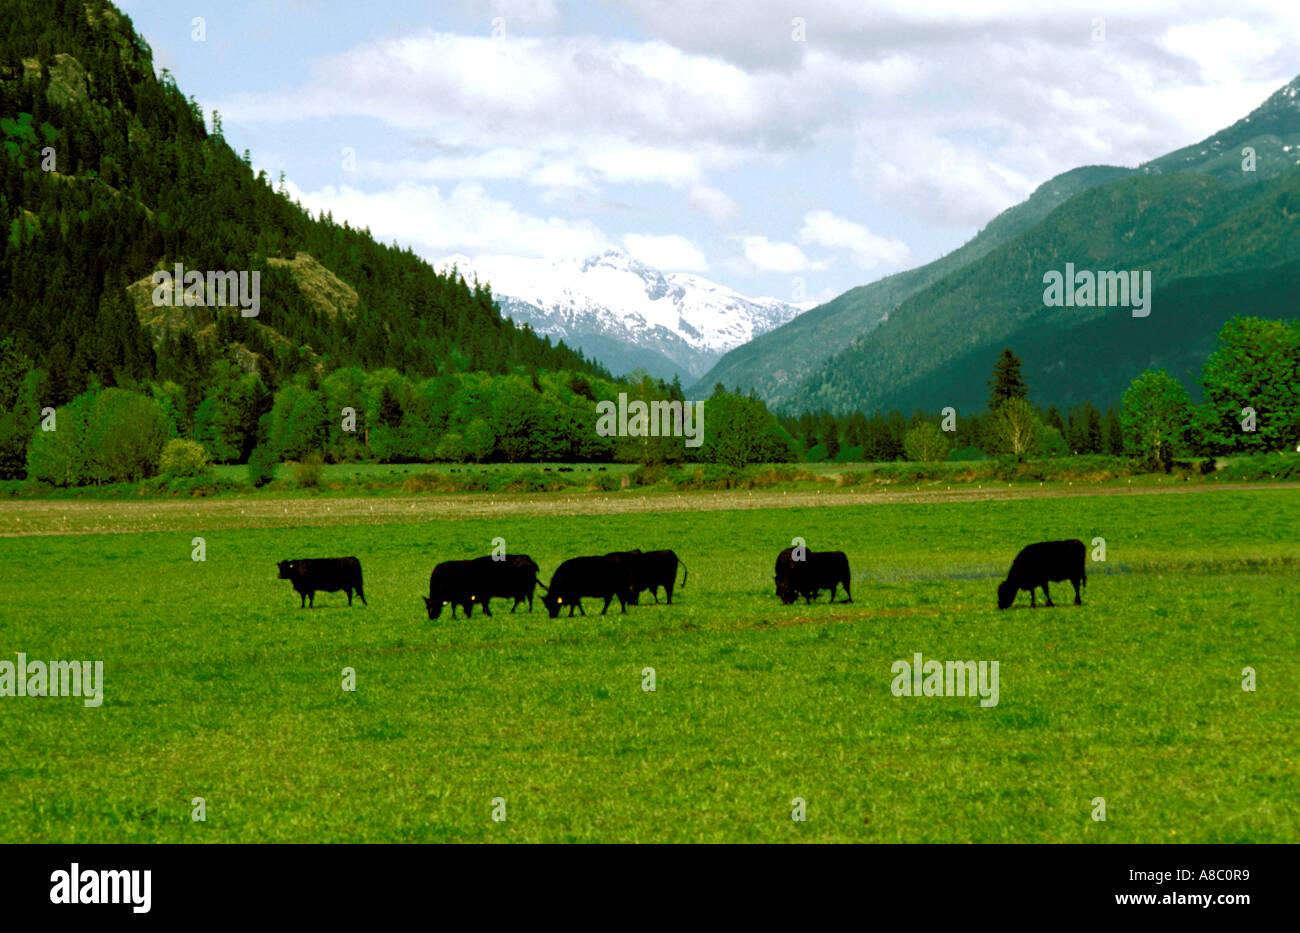 Washington North Cascades Angus Cattle along Skagit River - Stock Image